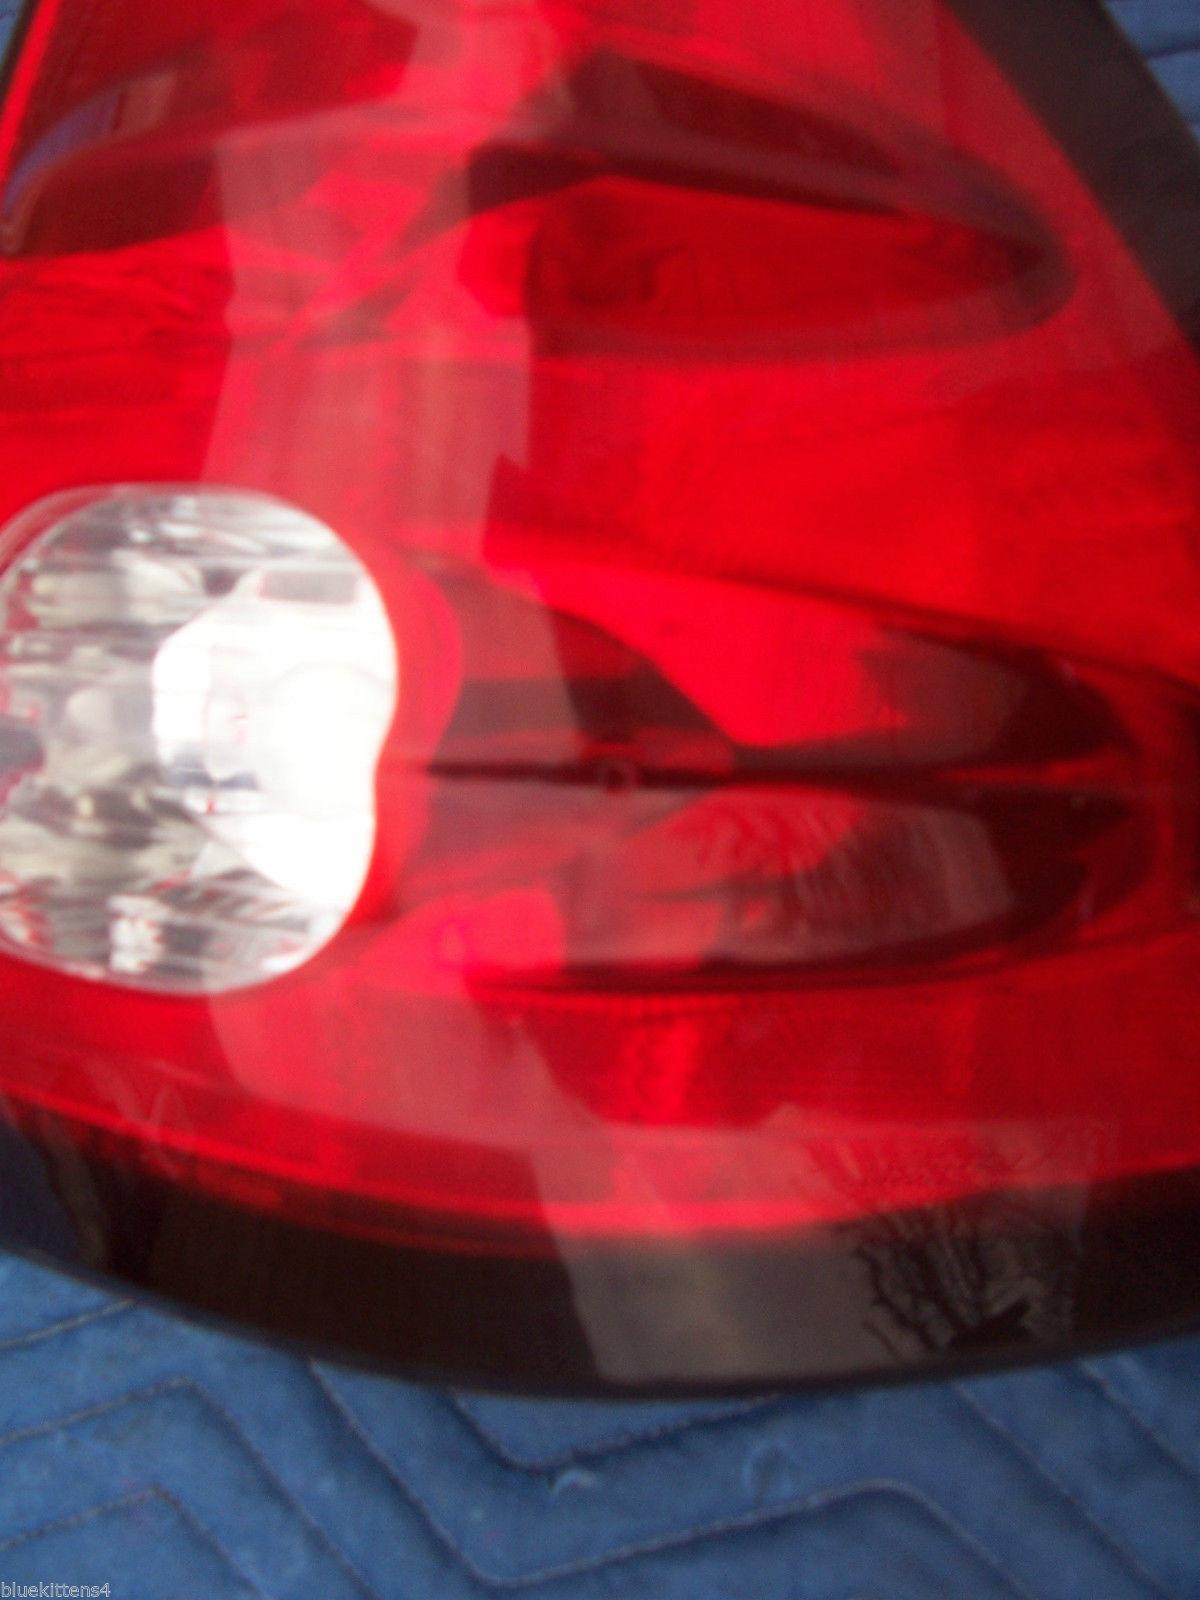 2001 AZTEC RIGHT TAILLIGHT OEM USED ORIGINAL PONTIAC GM PART 2002 2003 2004 2005 image 3